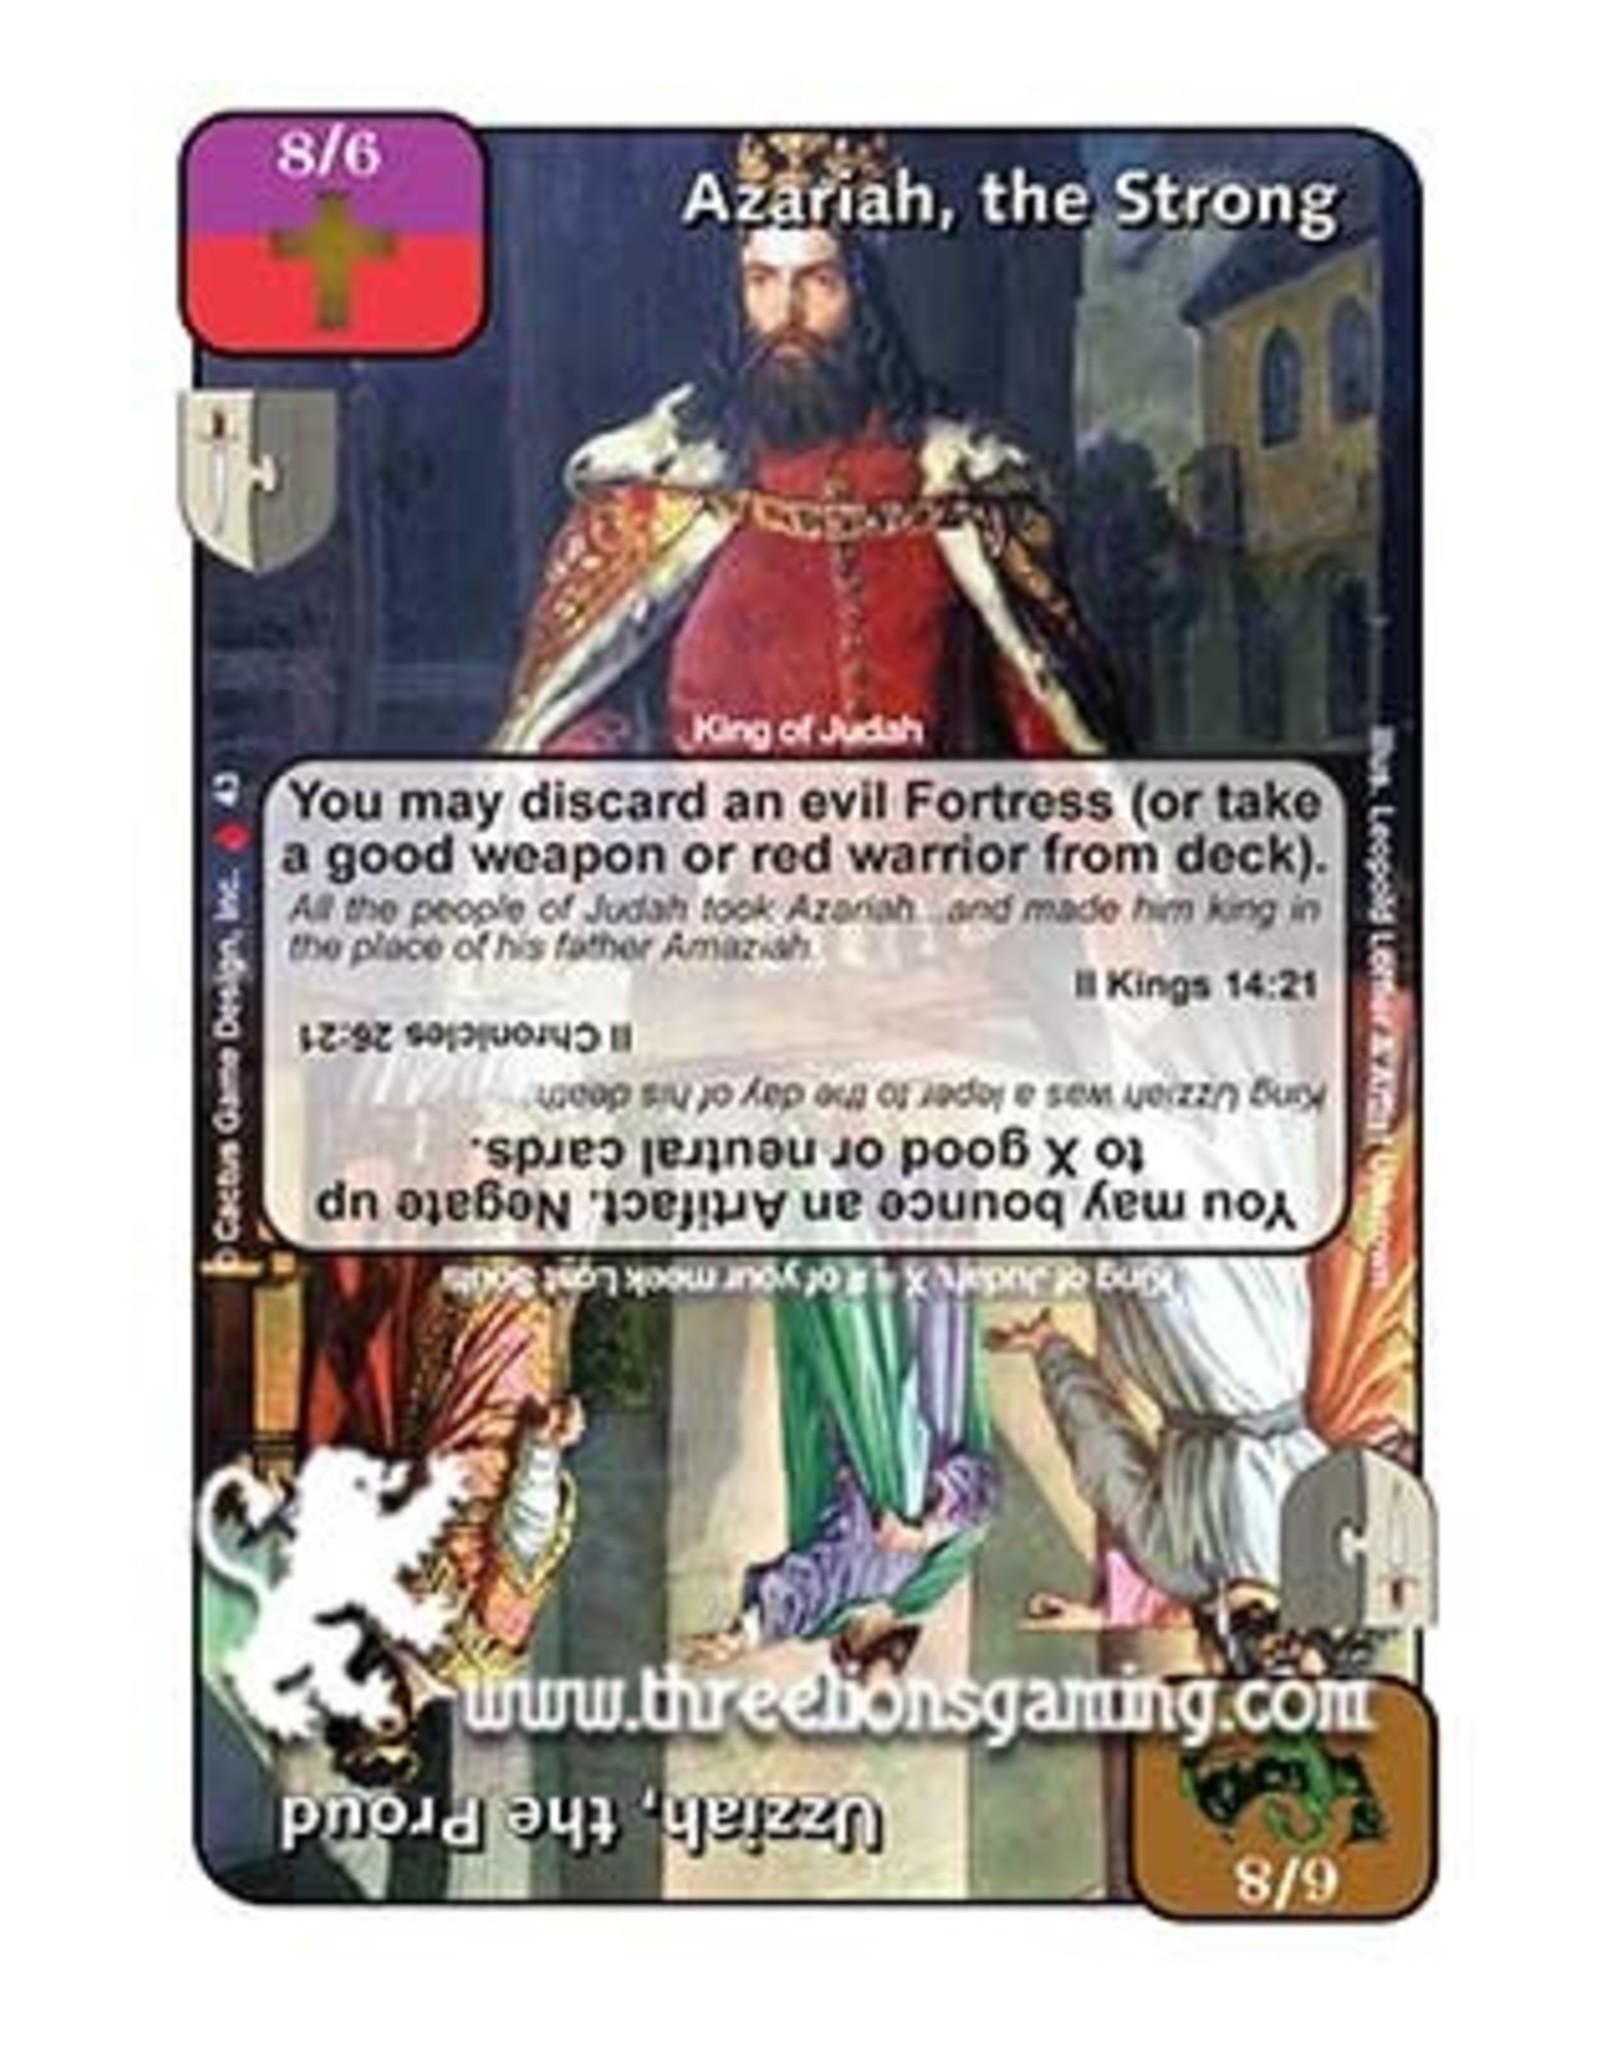 LoC: Azariah, the Strong / Uzziah, the Proud